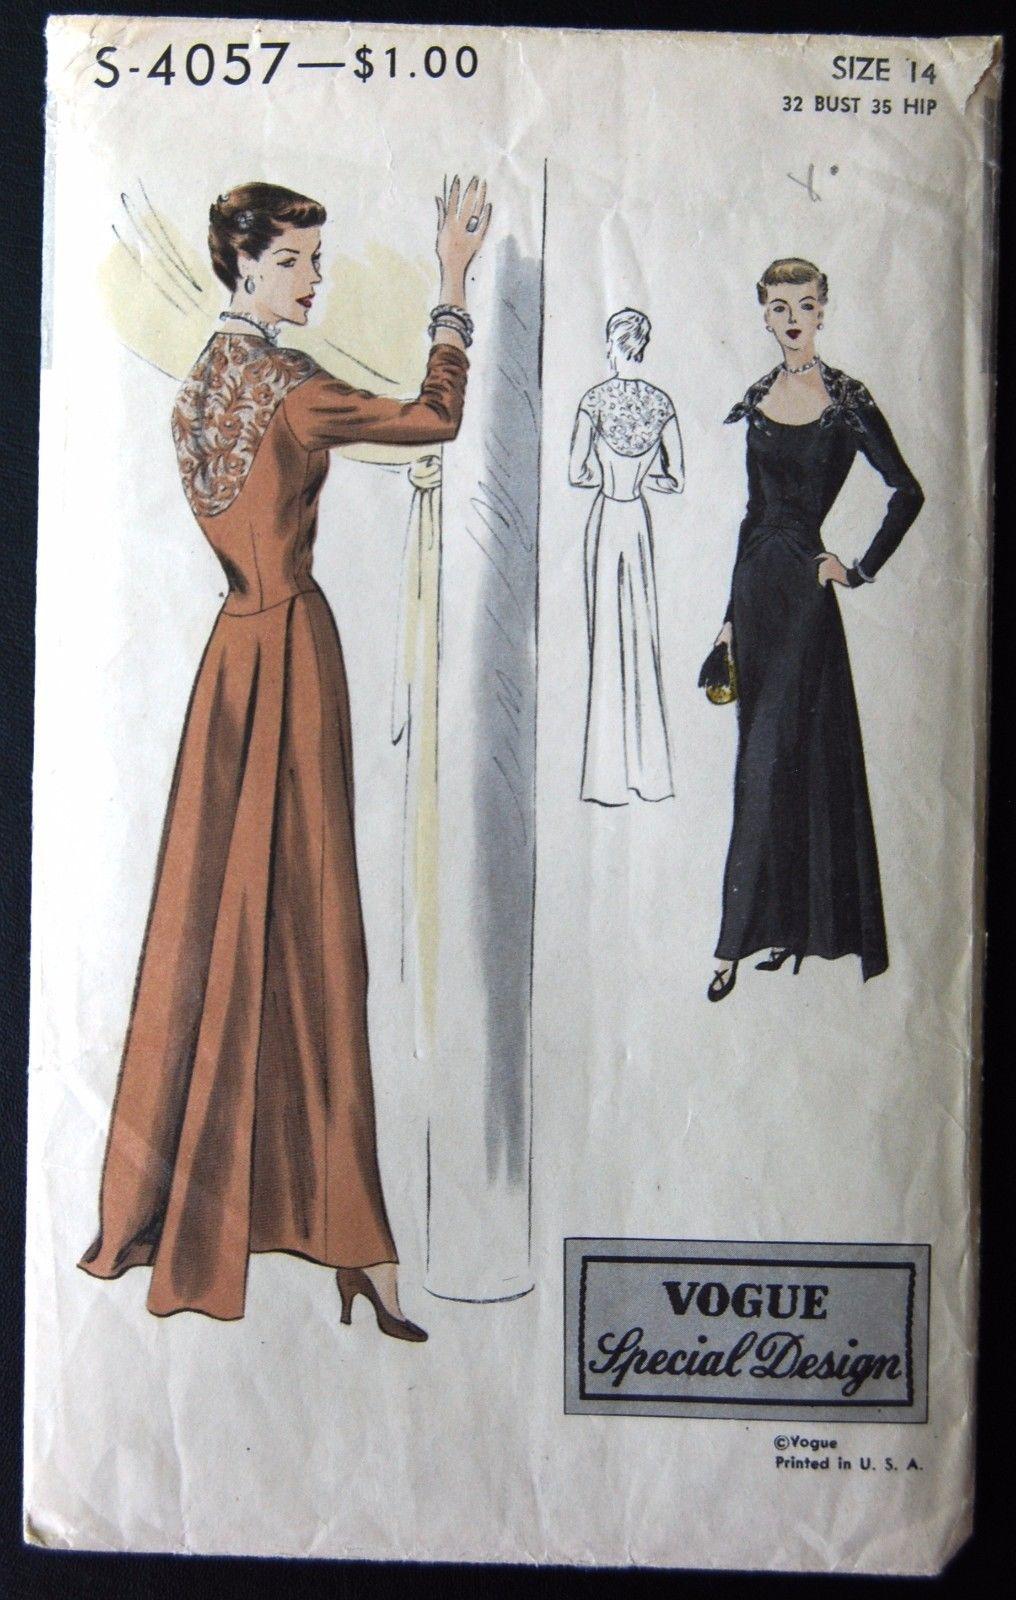 Vintage Original Vogue Special Design 40 S Evening Dress Pattern No S 4057 Vintage Clothes Patterns Retro Fashion Vintage Vintage Vogue Patterns